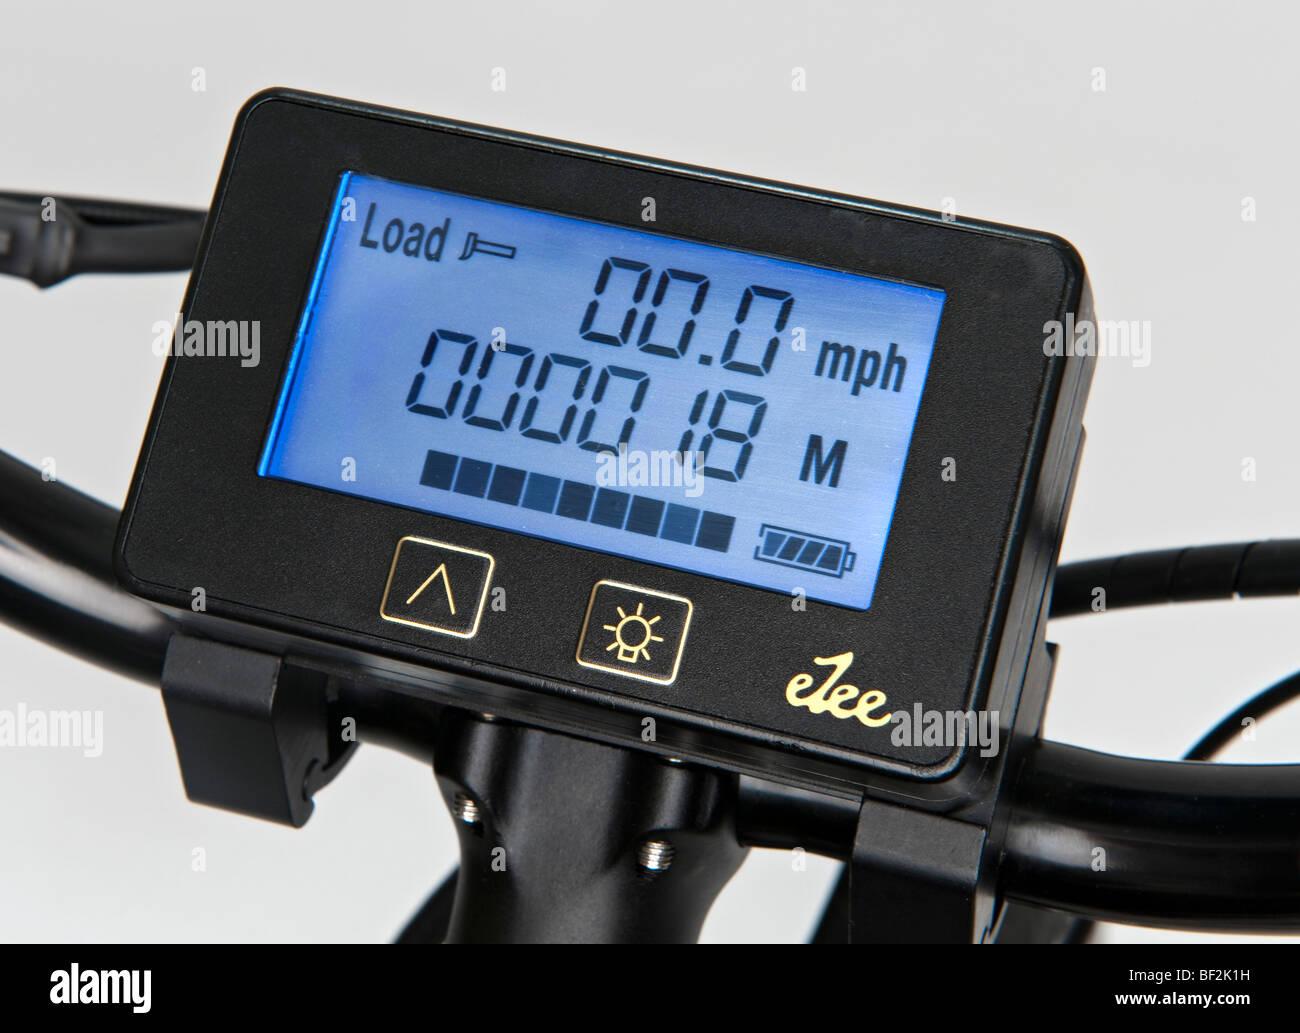 The Handlebar Computer On An Ezee Sprint Electric Bike Showing